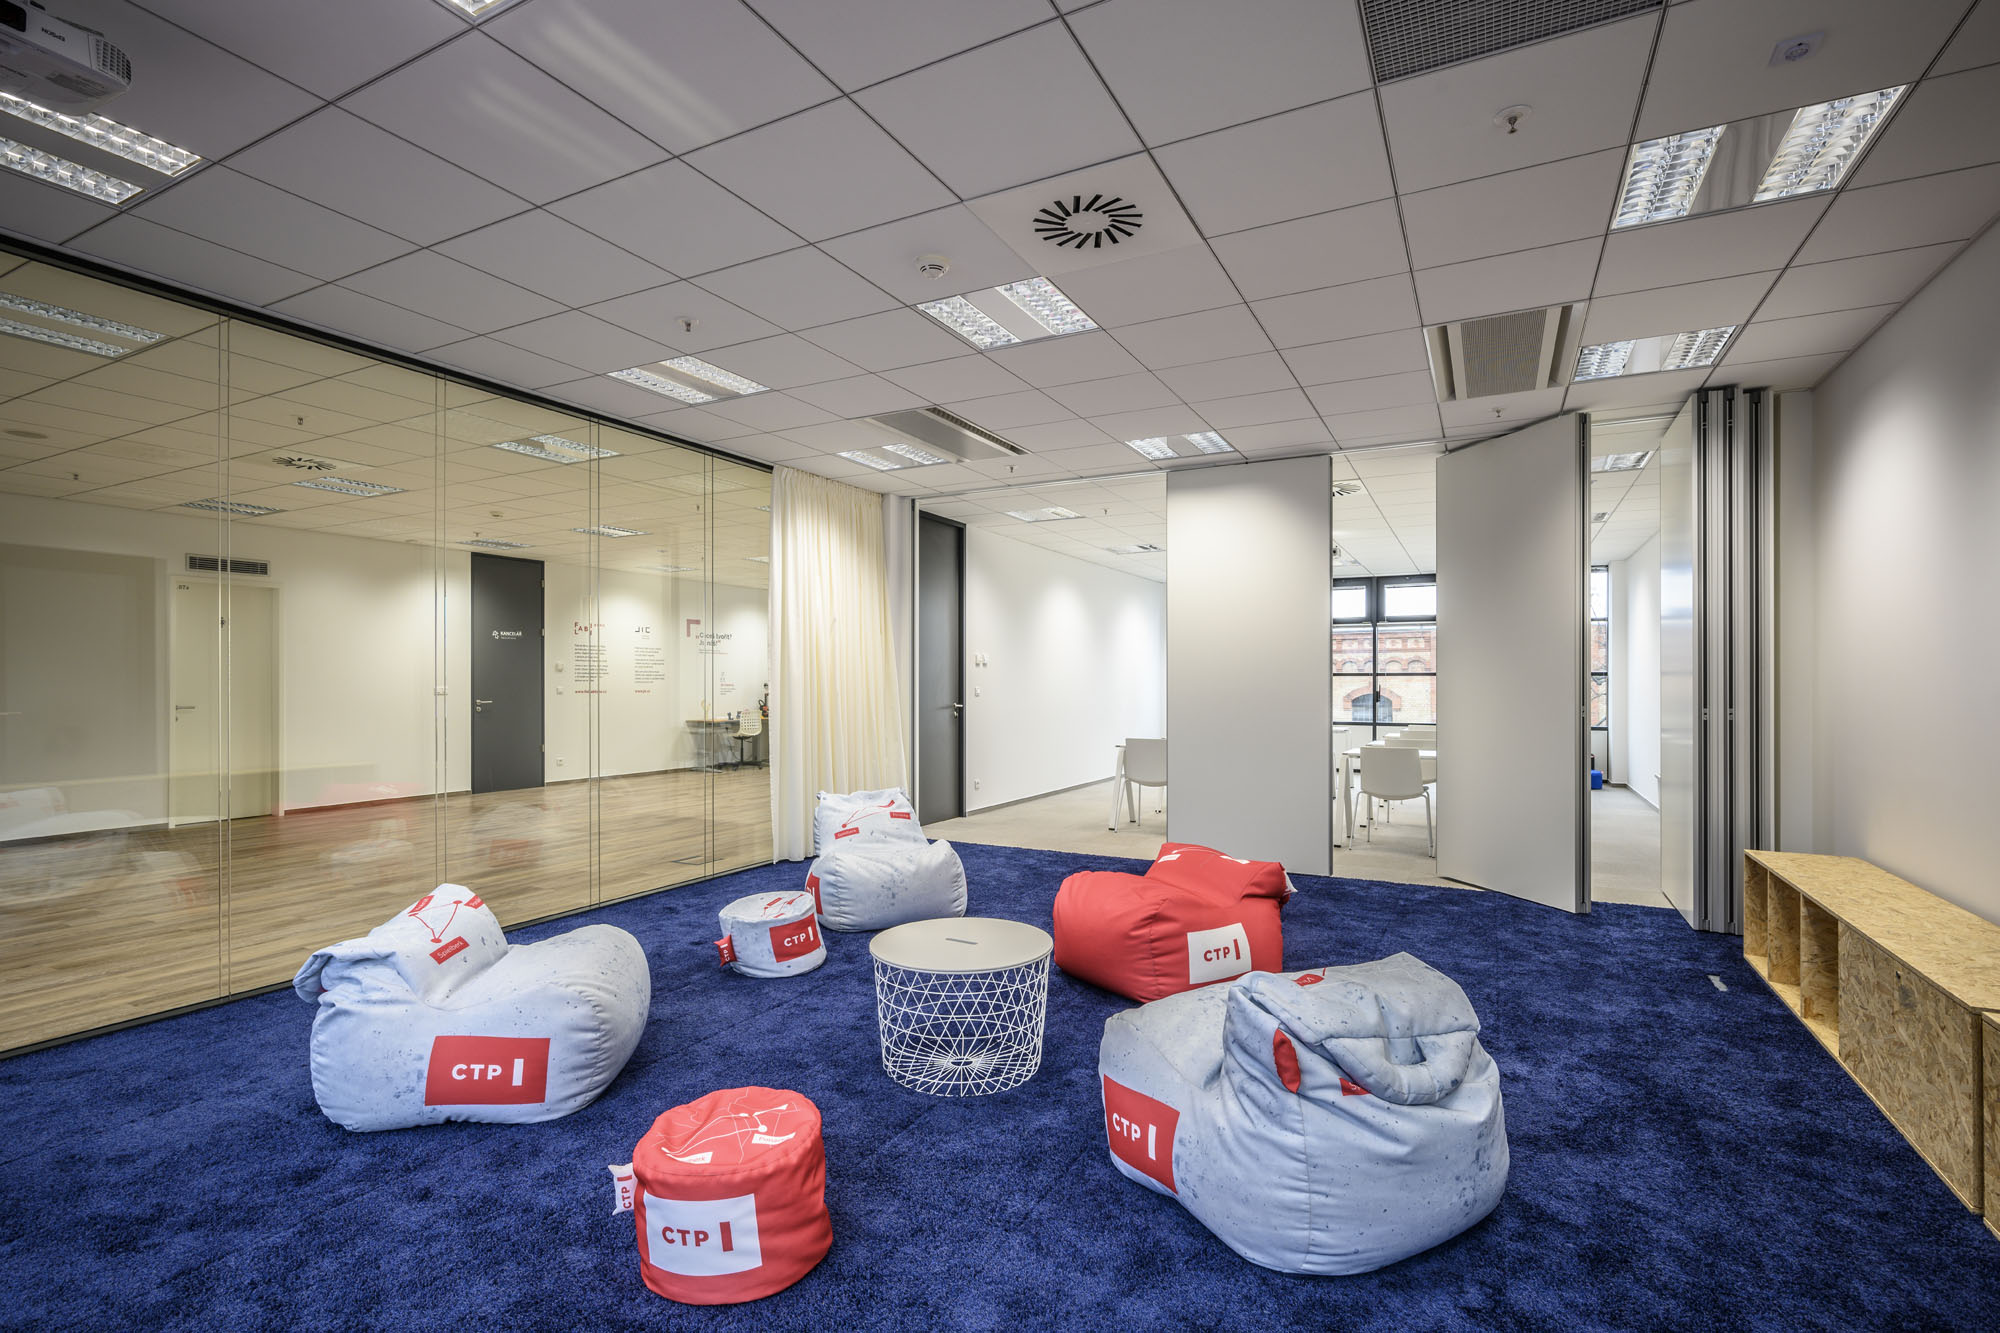 Moderne Büros müssen flexibel sein